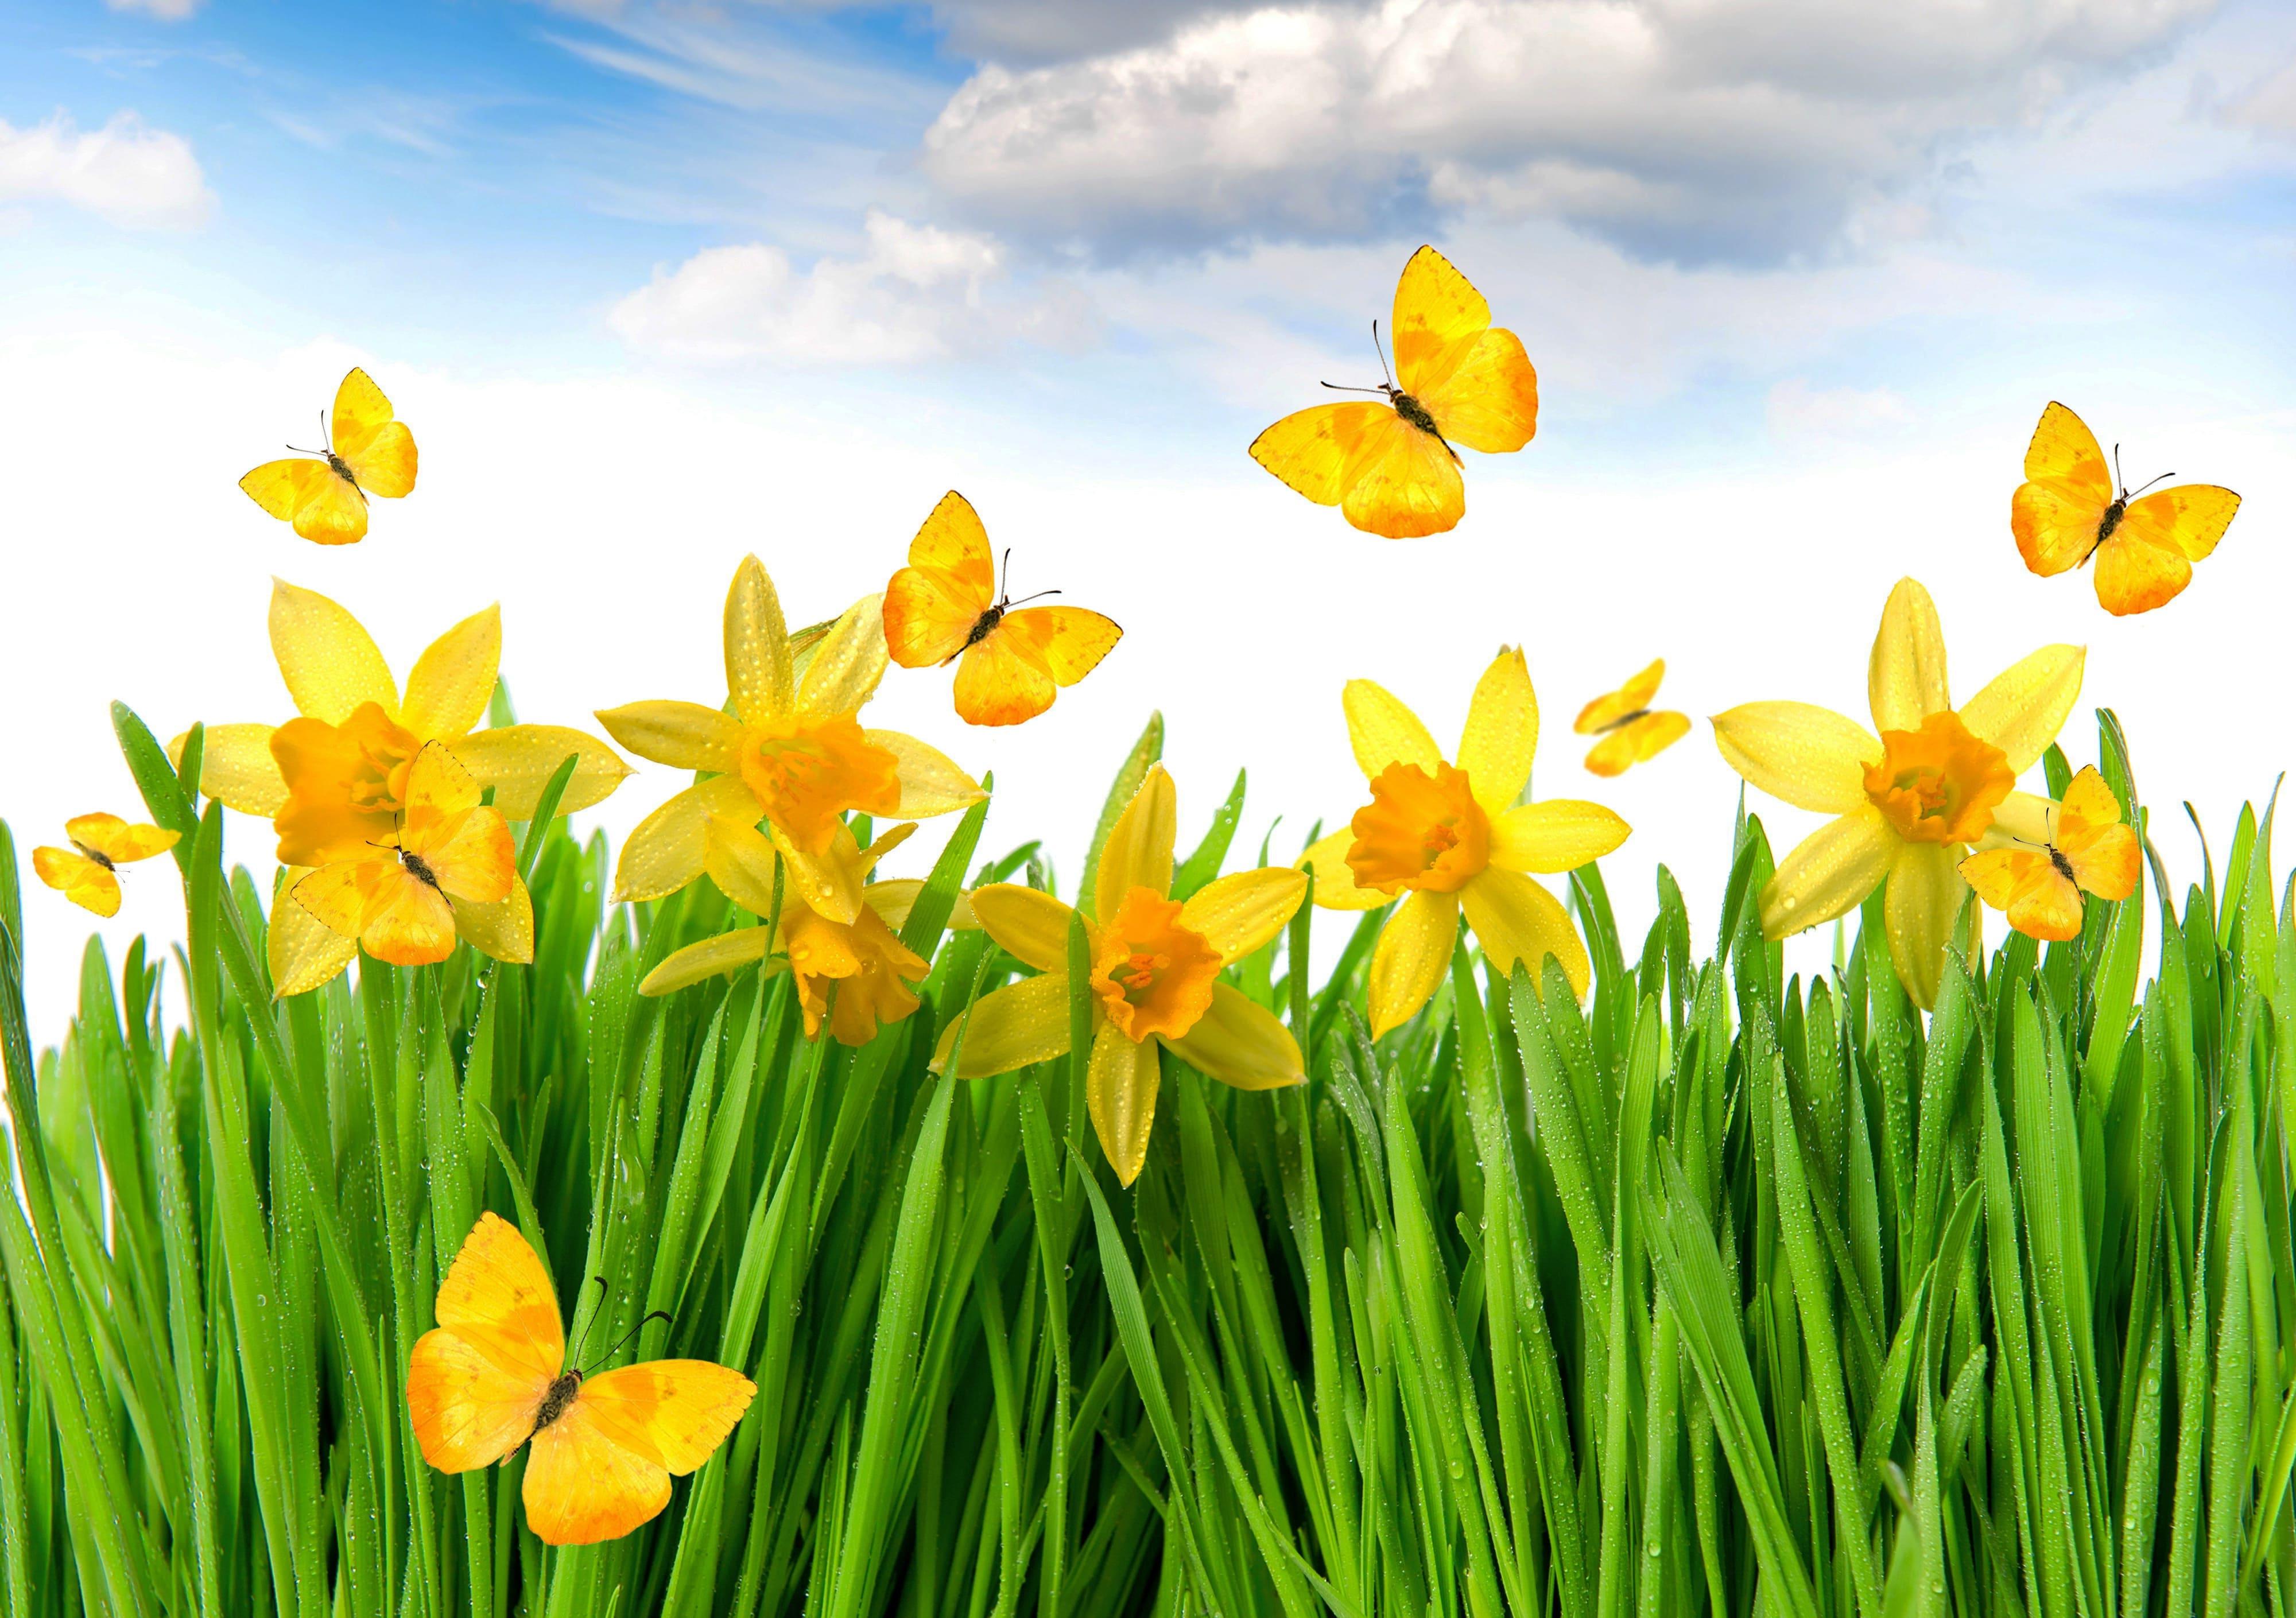 daffodils-photo-38